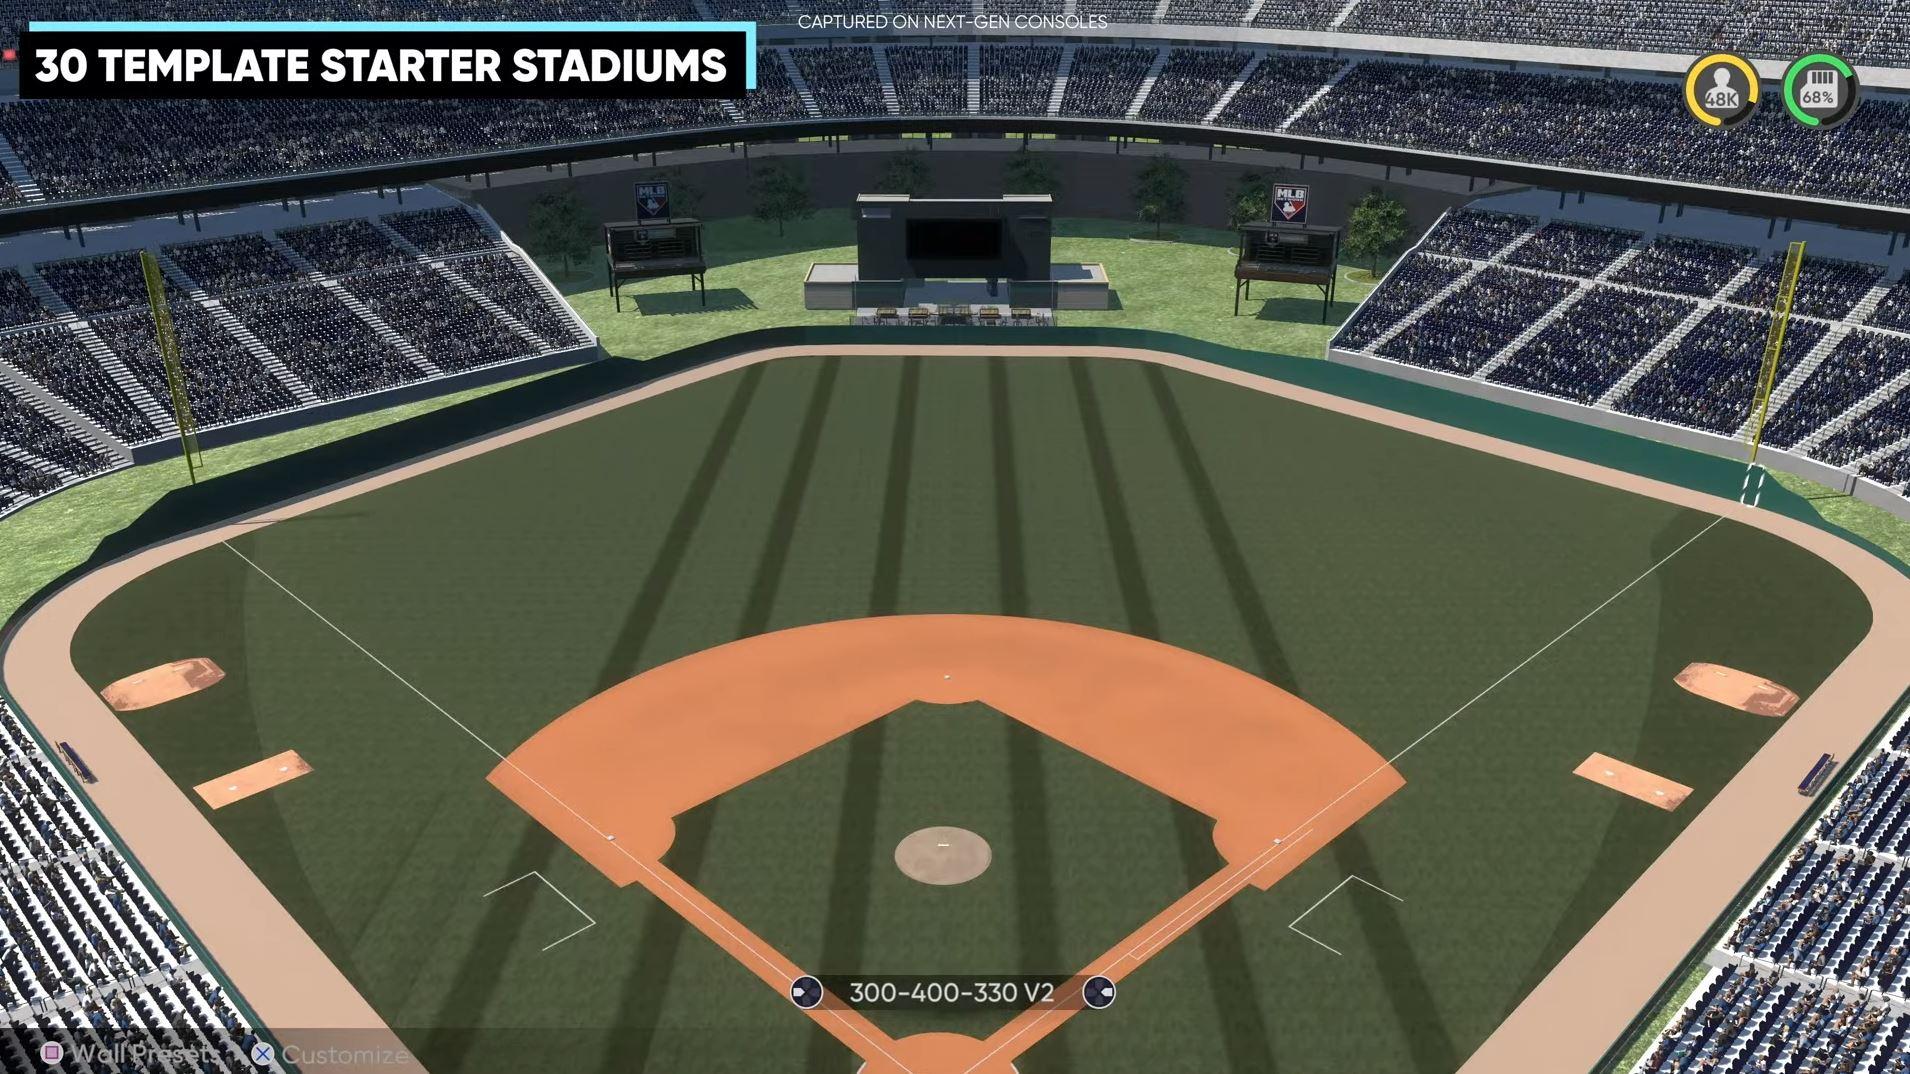 mlb the show 21 stadium creator templates